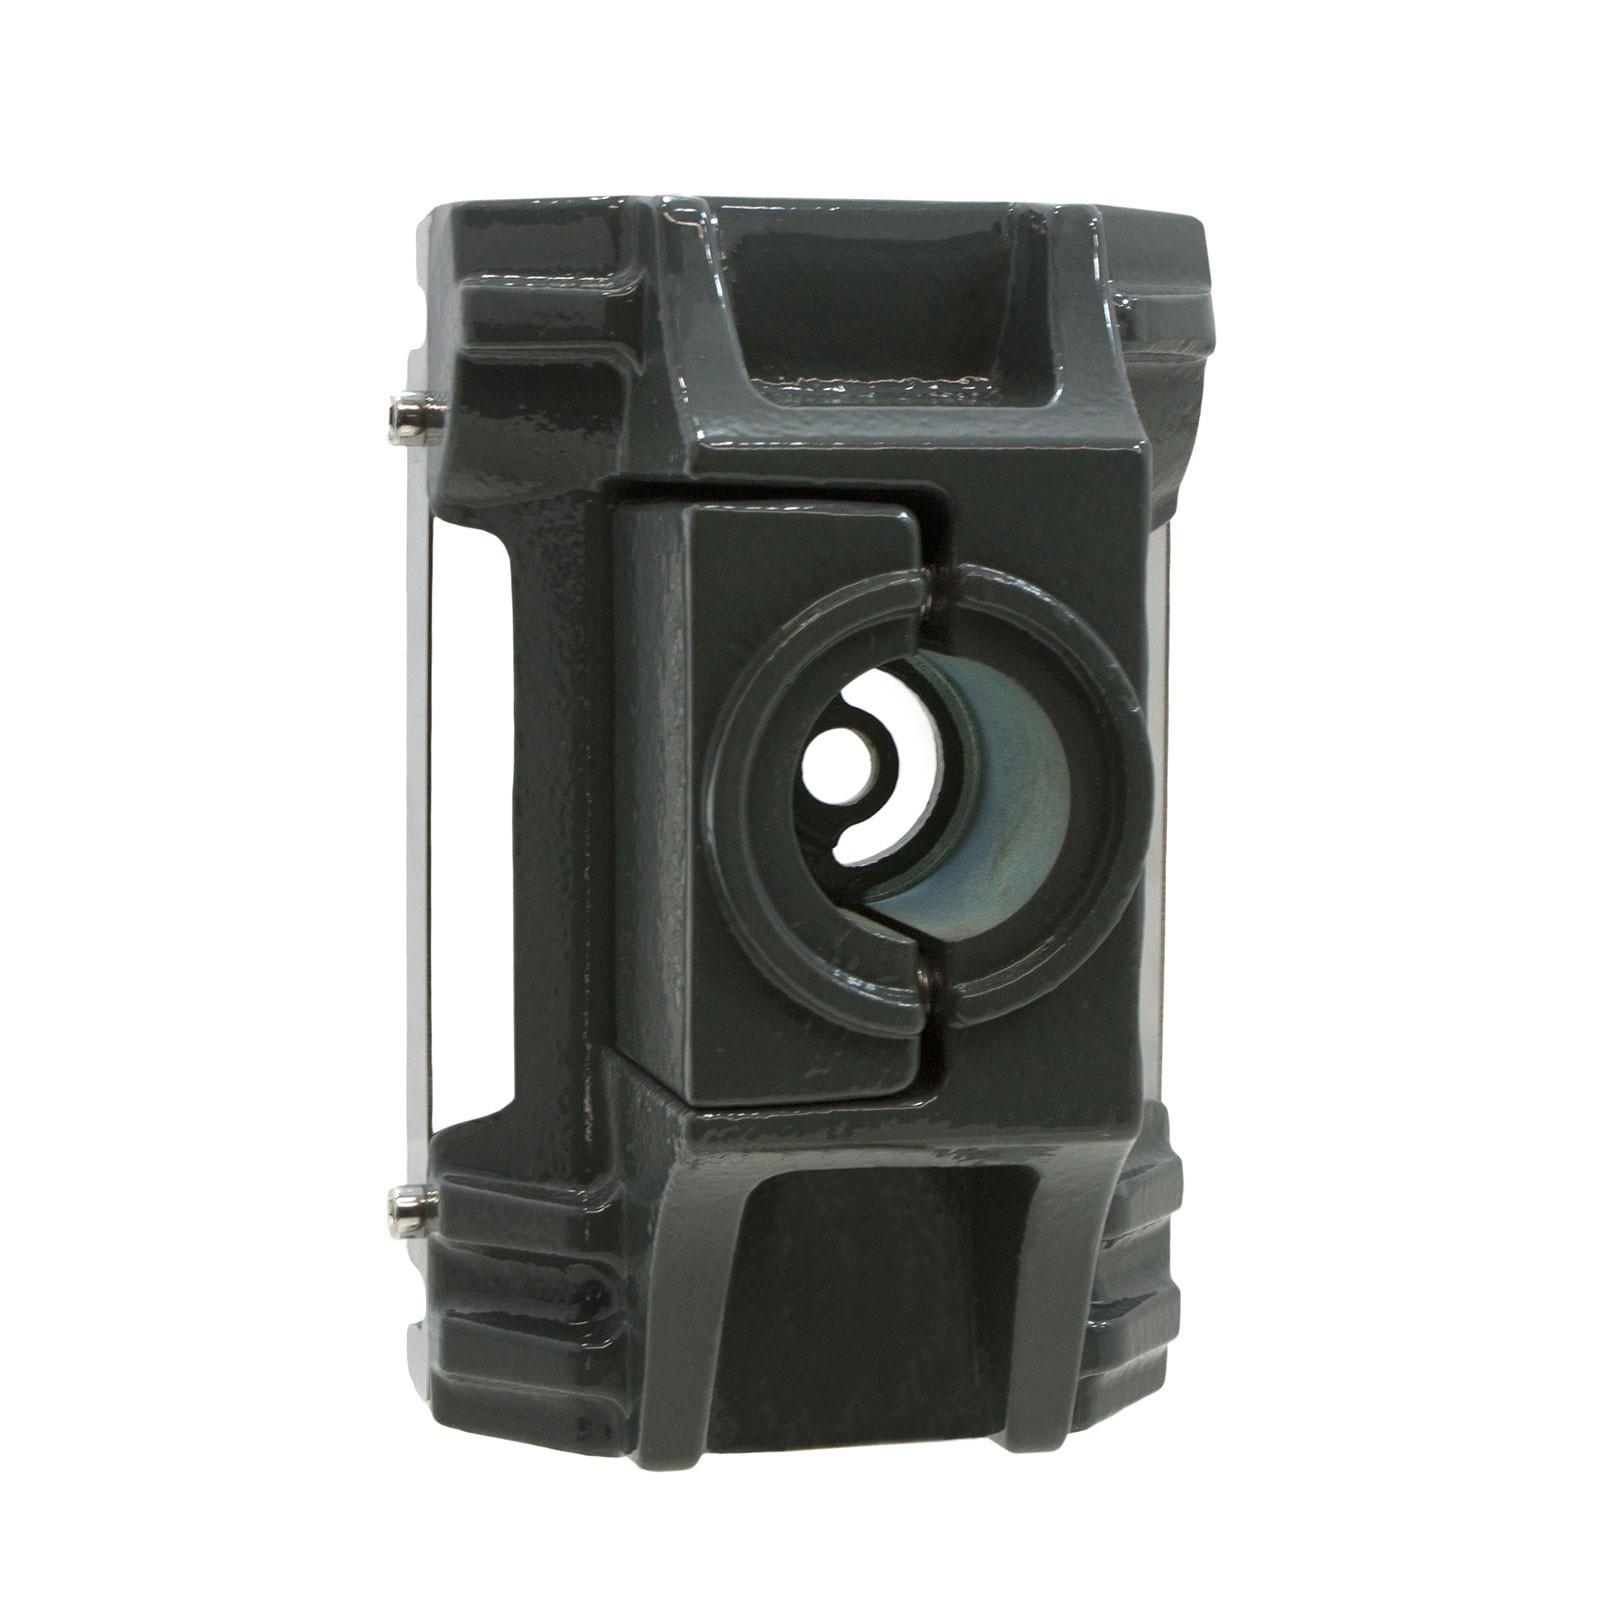 Solar Lights Jd Williams: Magnetic AutoControl MicroDrive Break Away Flange (12ft